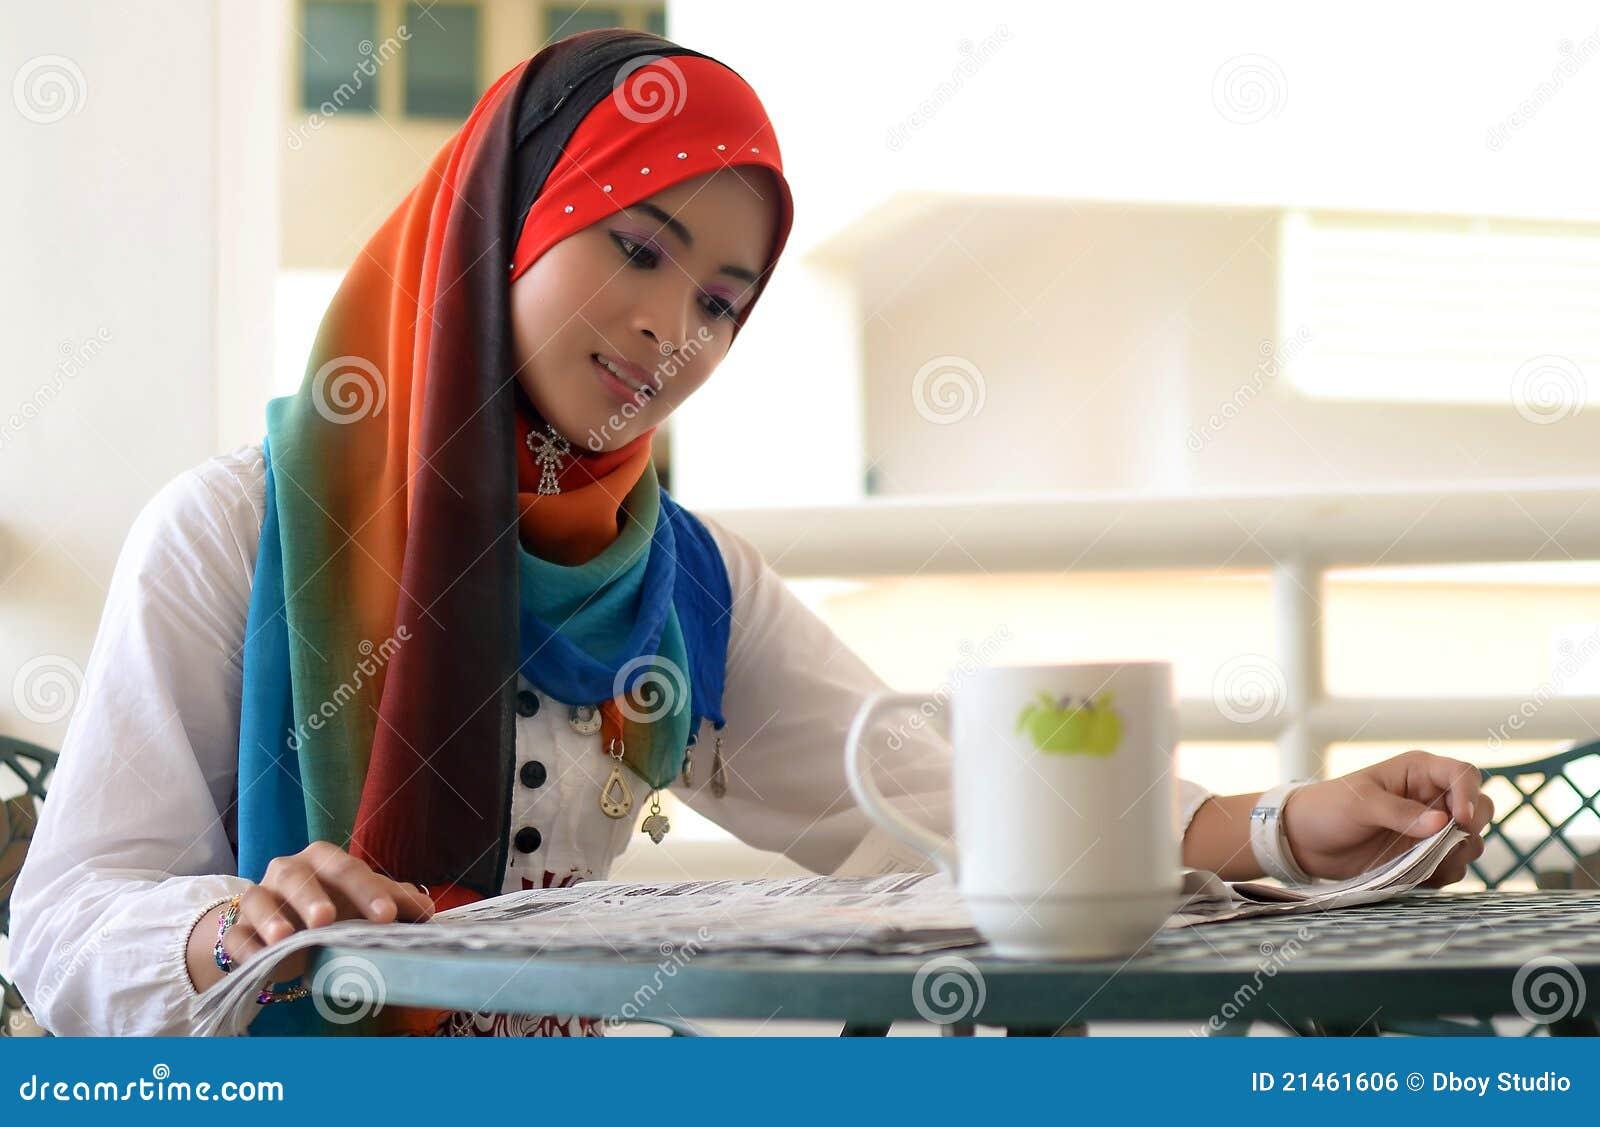 Le joli musulman féminin affiche le journal